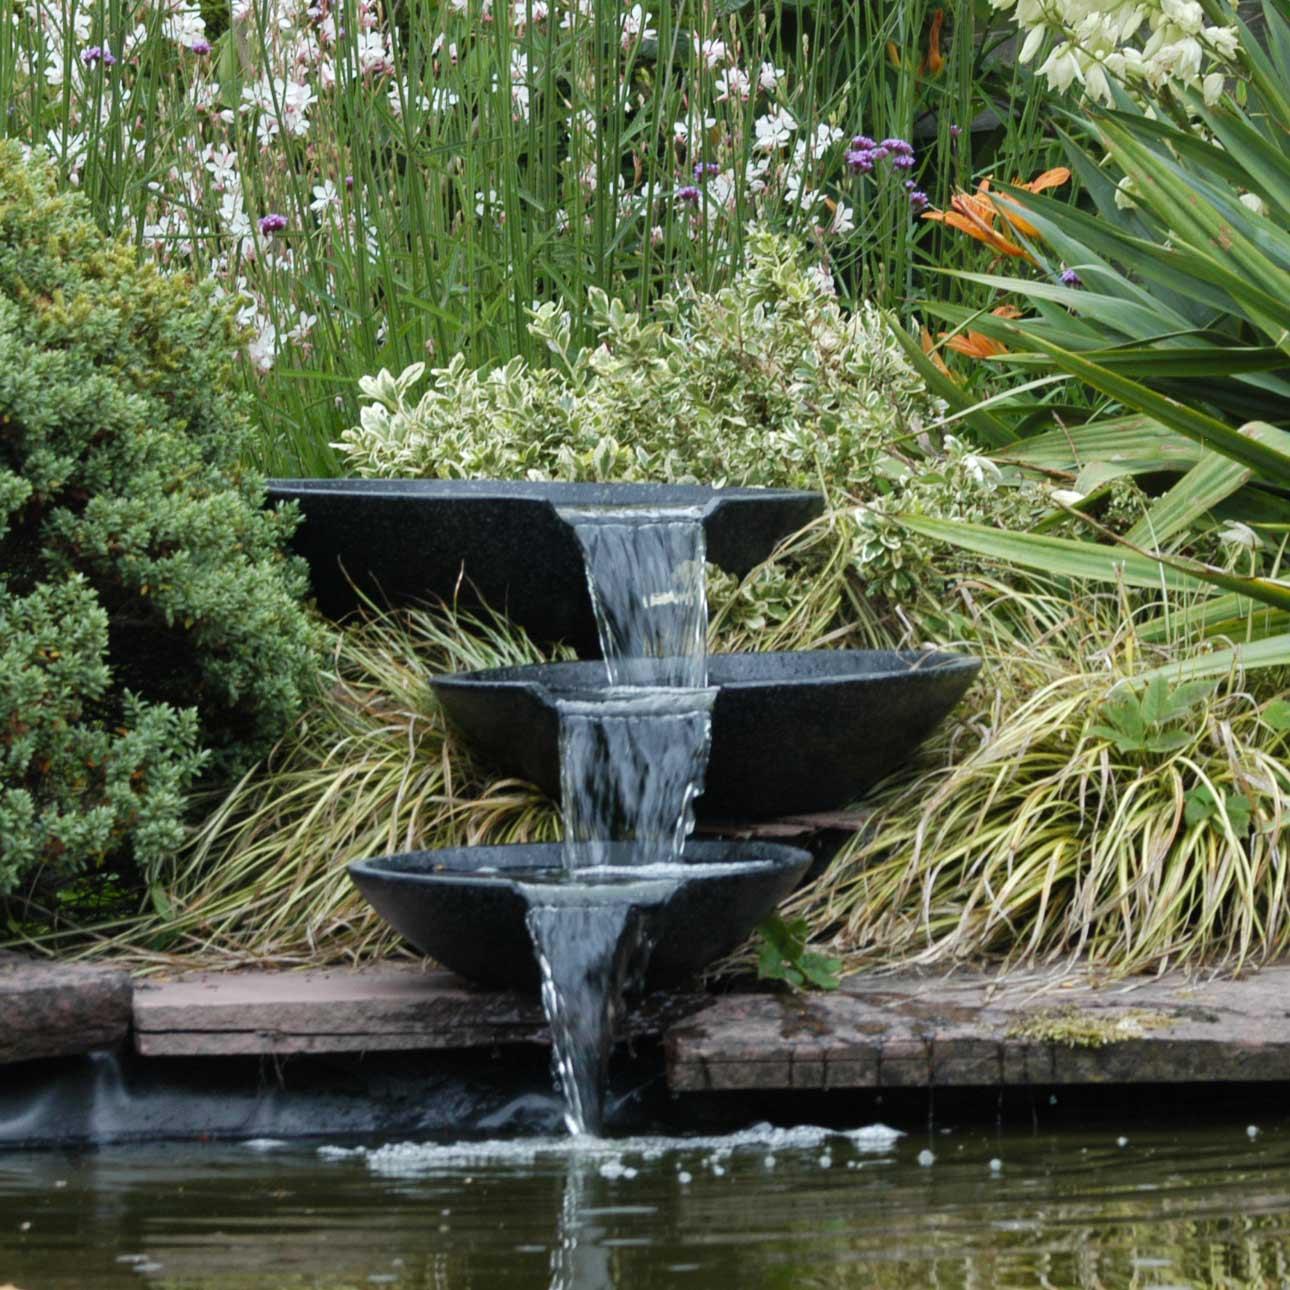 bassin et fontaine relaxant jardin